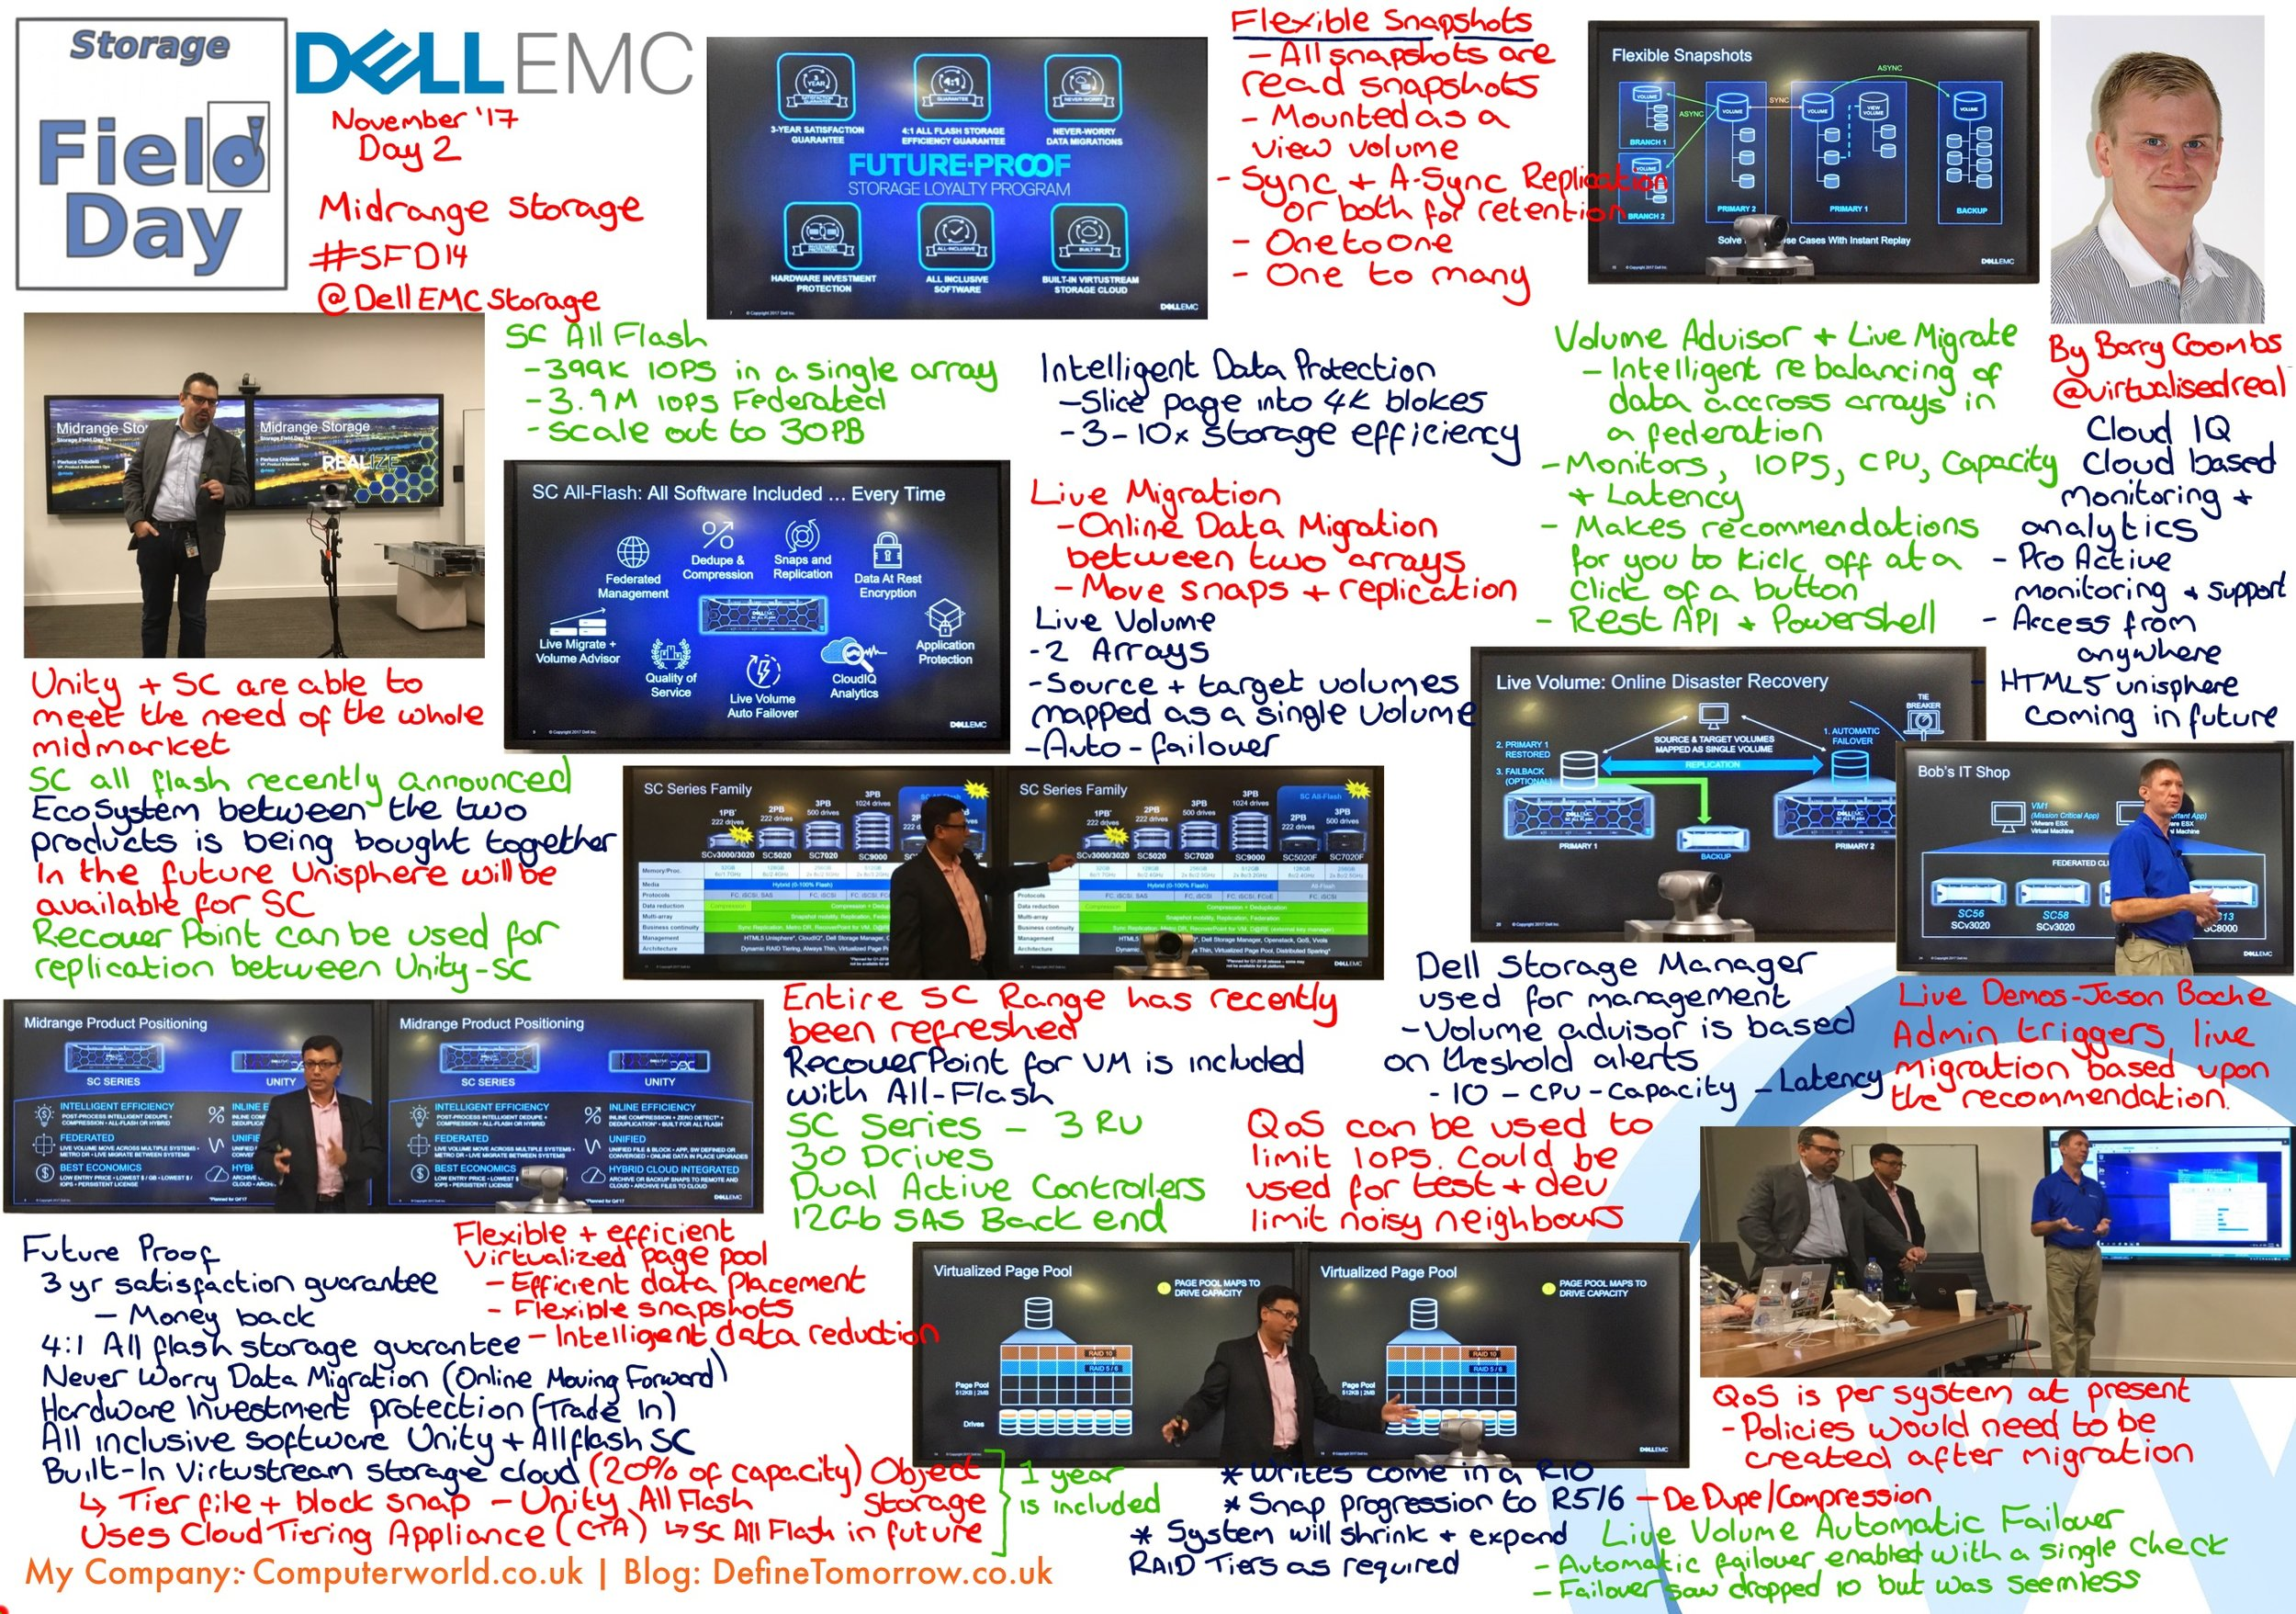 DellEMC Midrange Storage